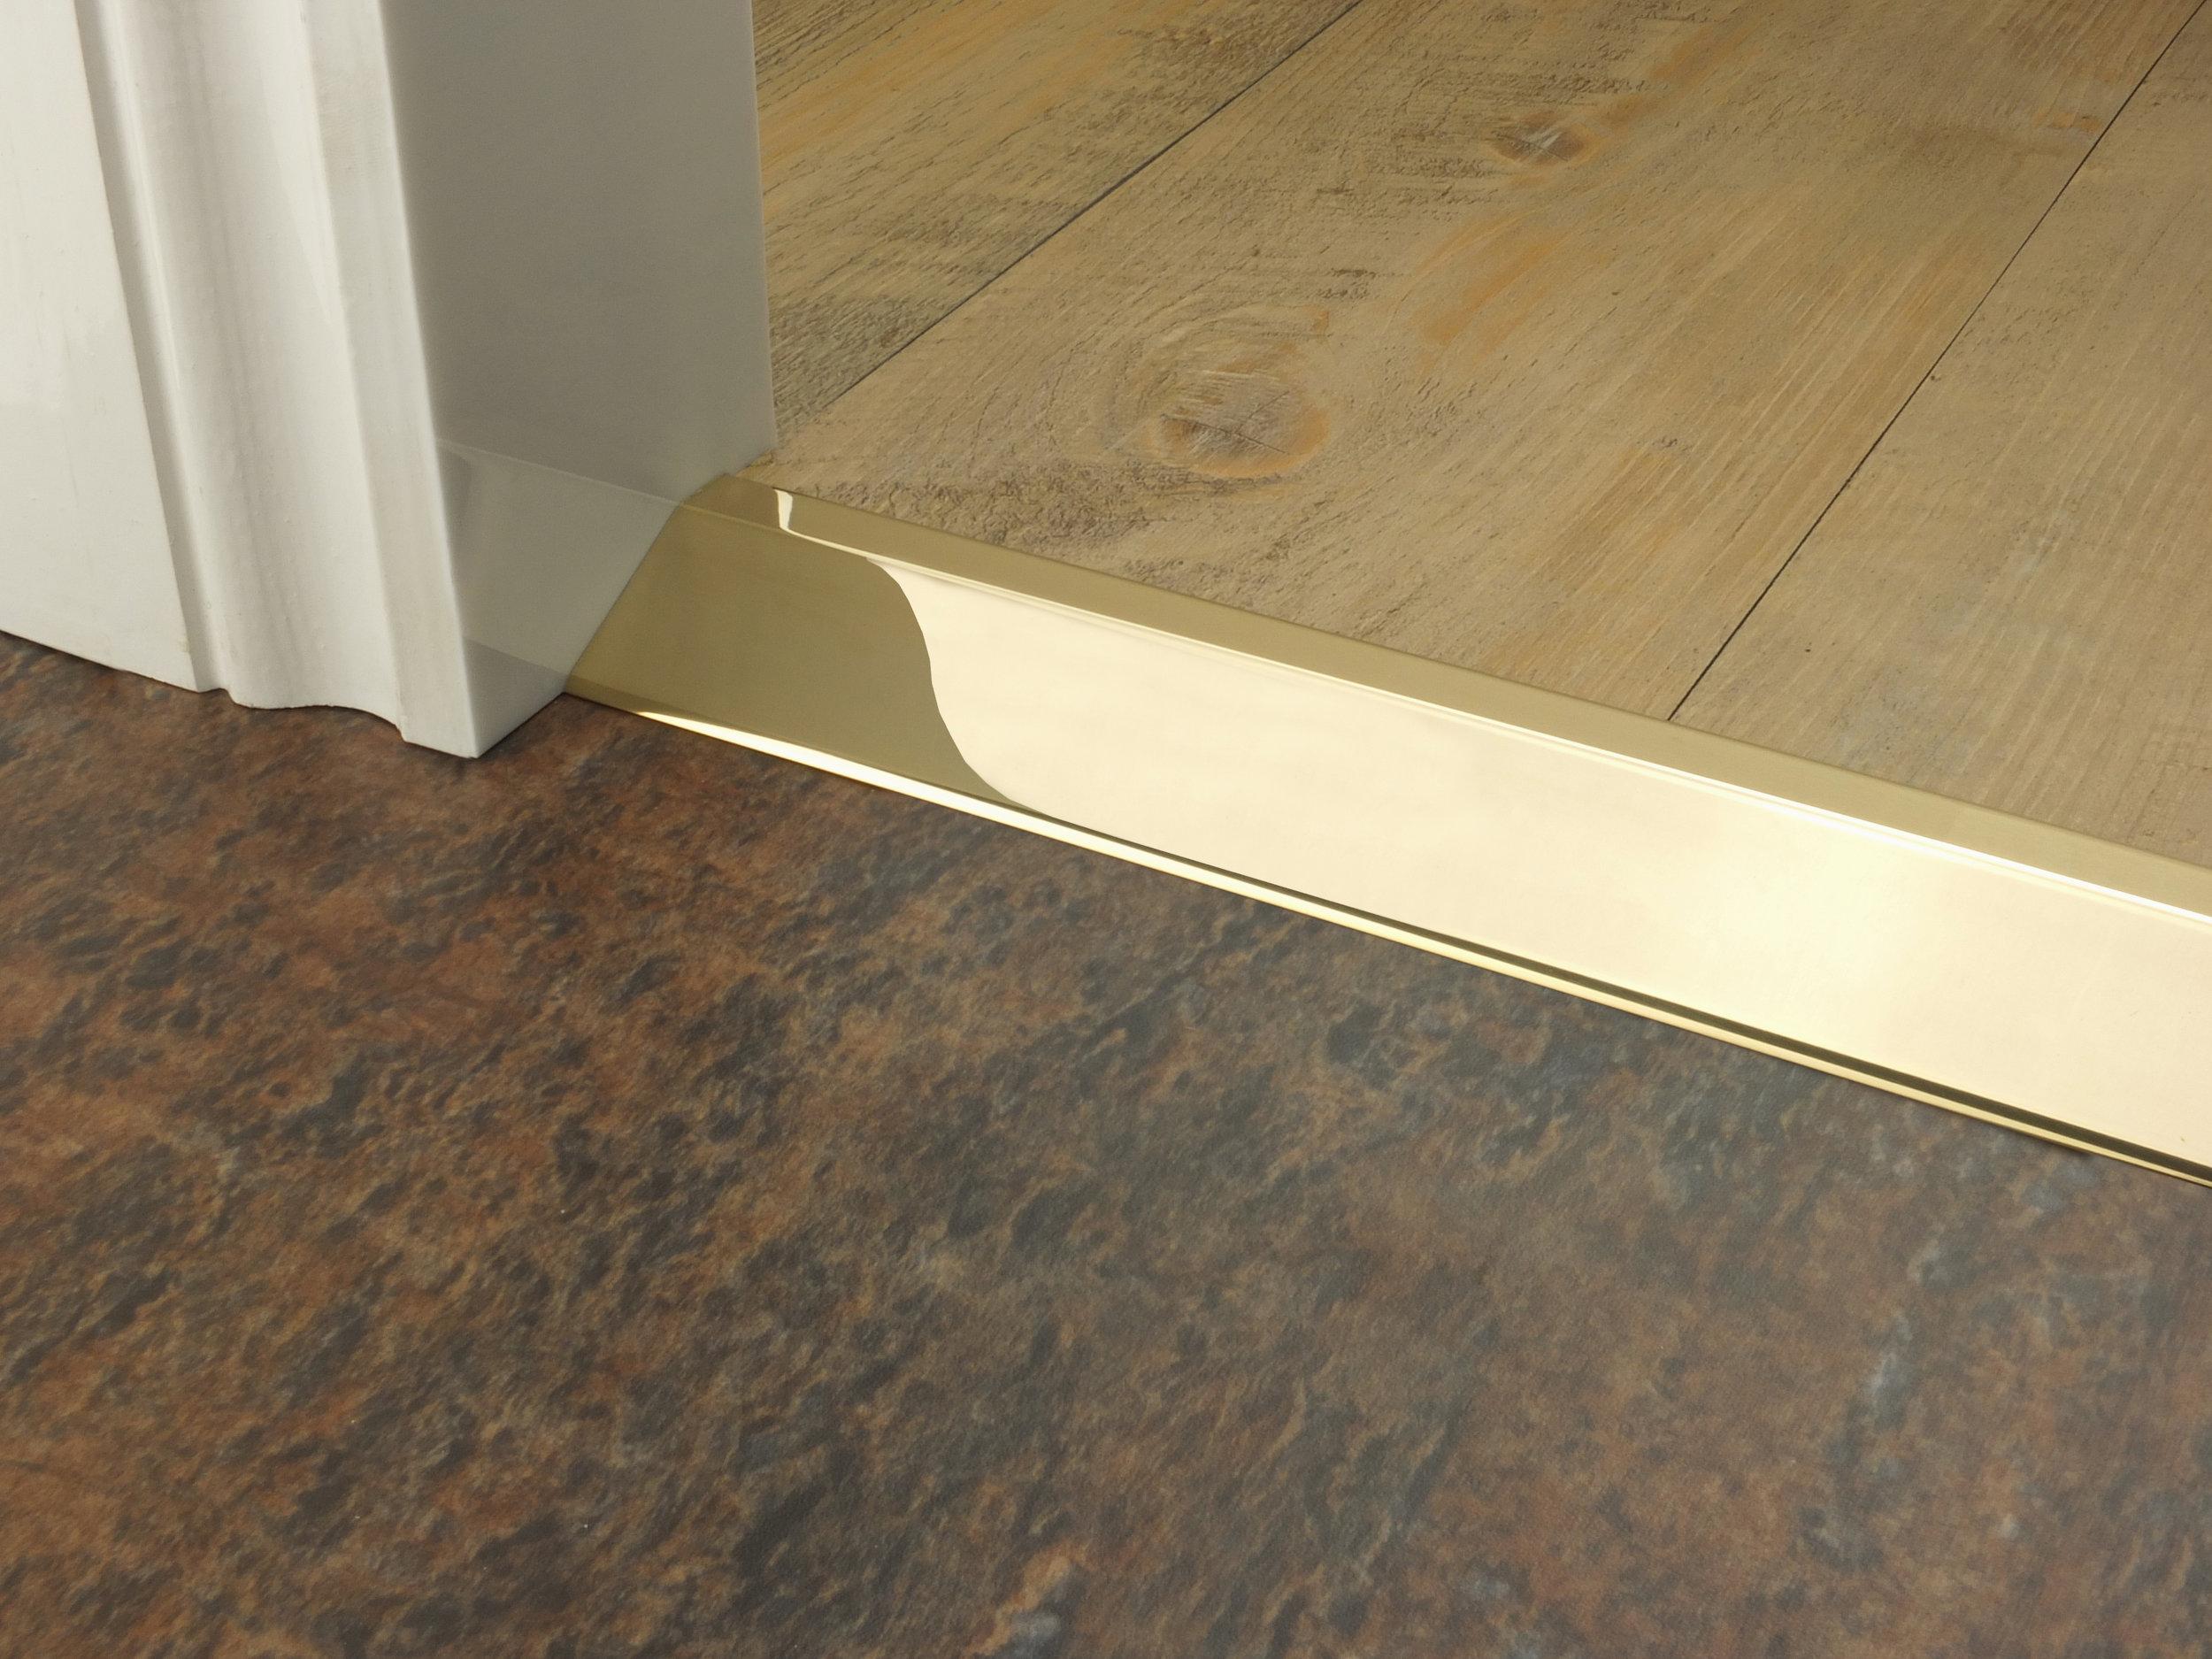 stairrods-doorbar-brass-16mm-ramp2.jpg